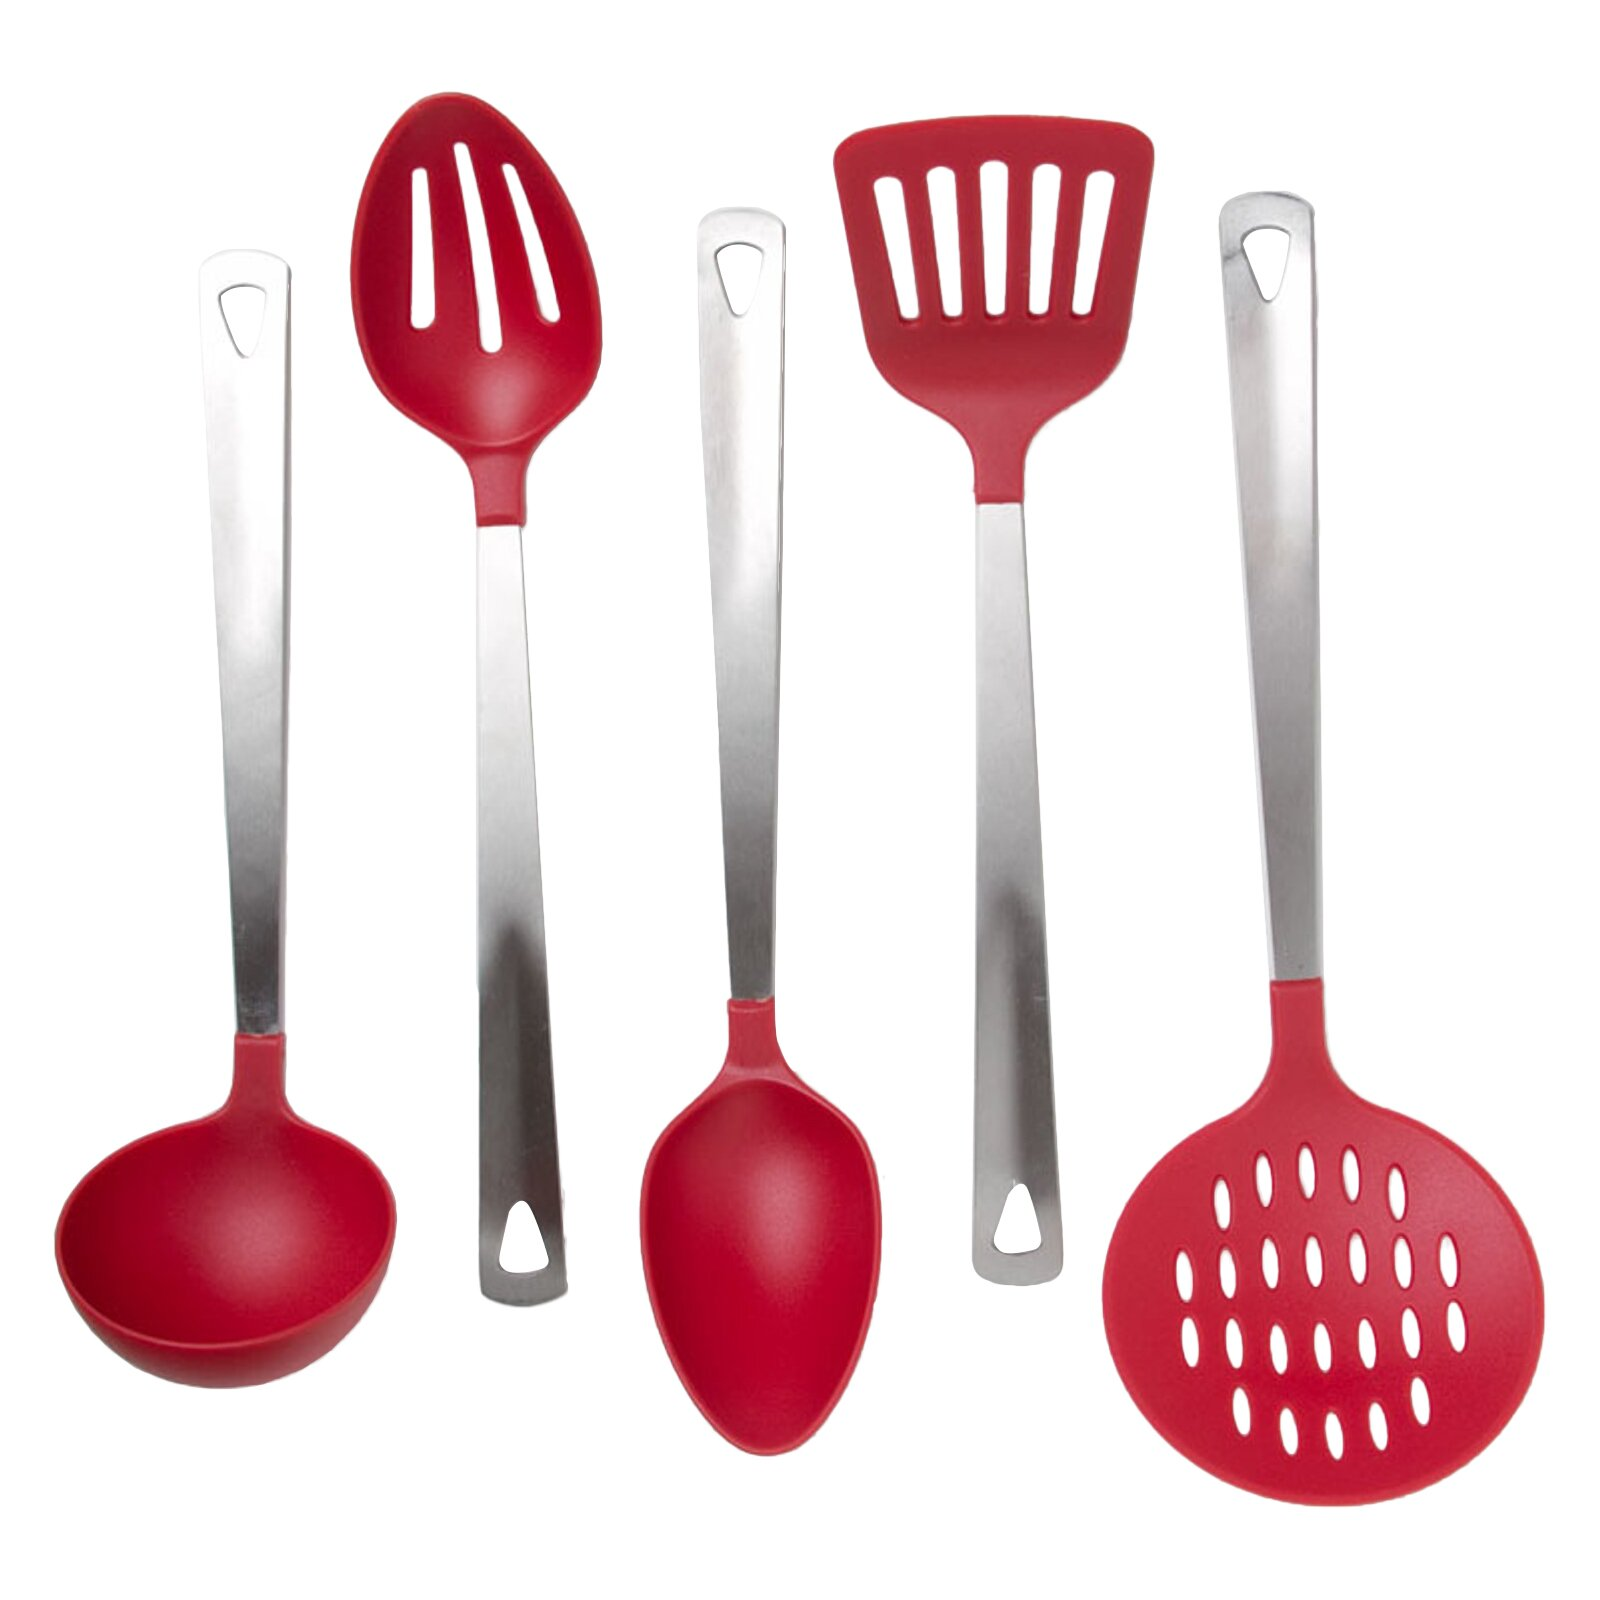 Prime pacific cook 39 s corner 5 piece kitchen utensil set for Kitchen set utensils